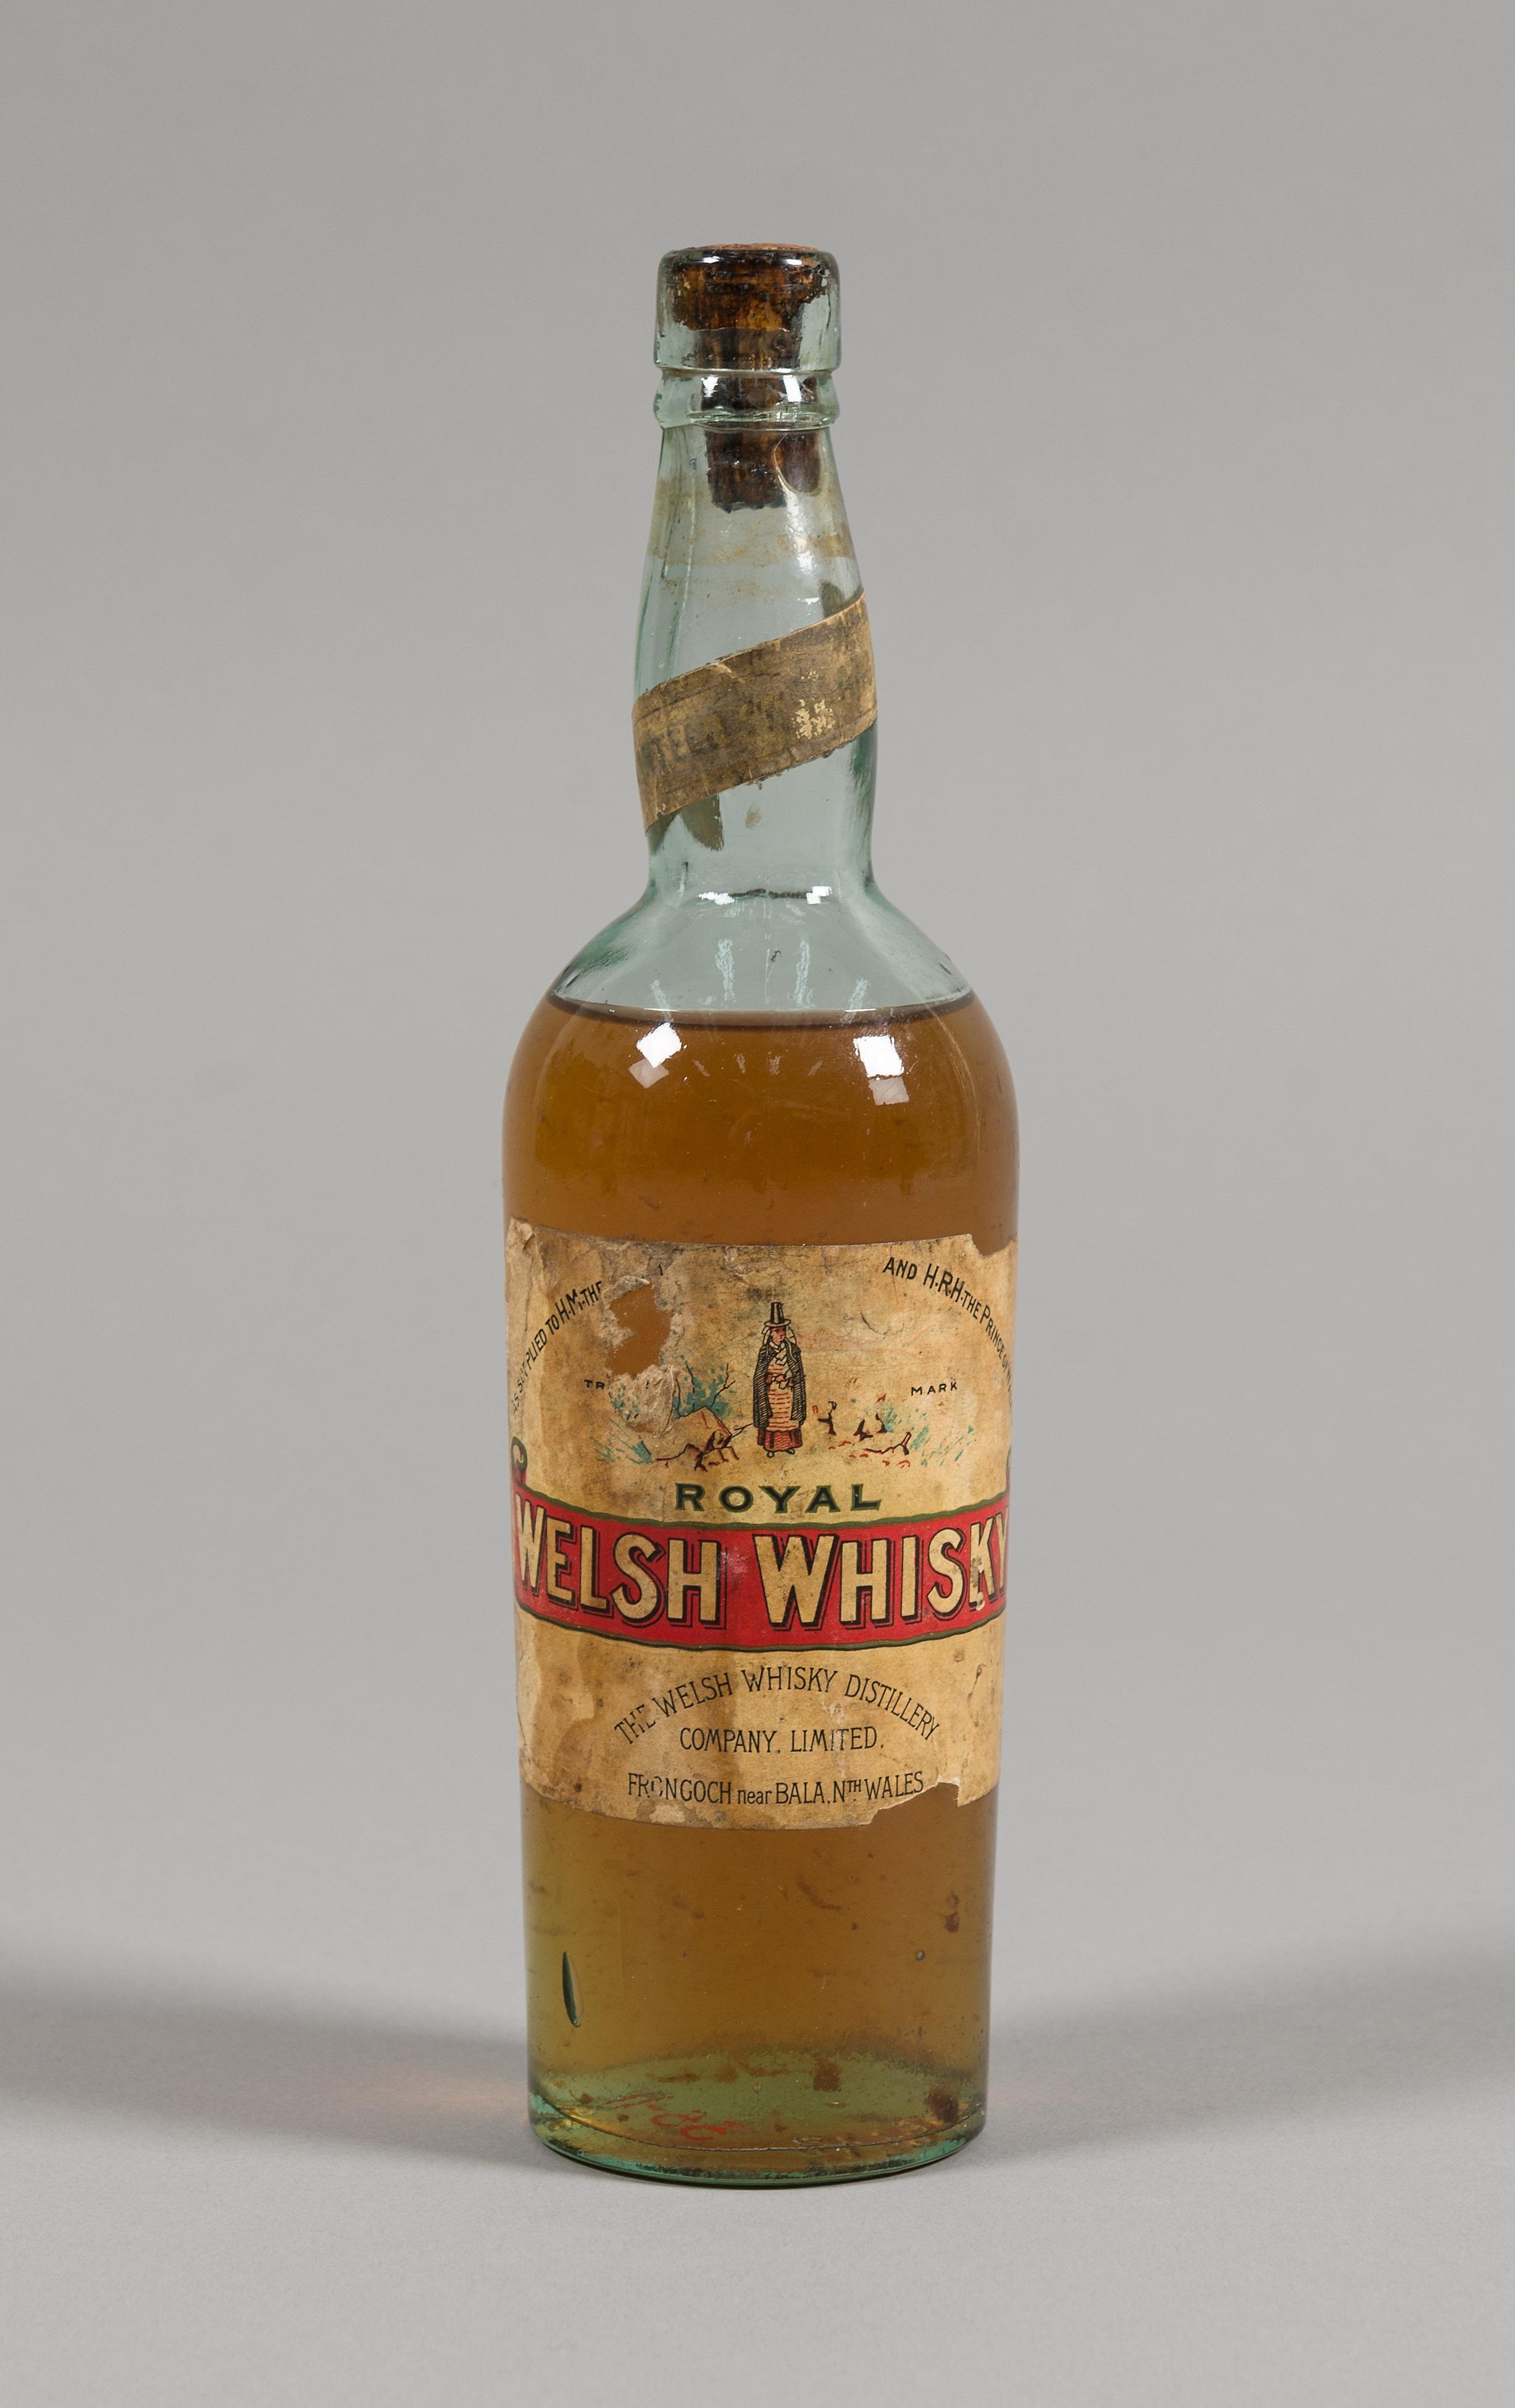 Royal Welsh whisky bottle